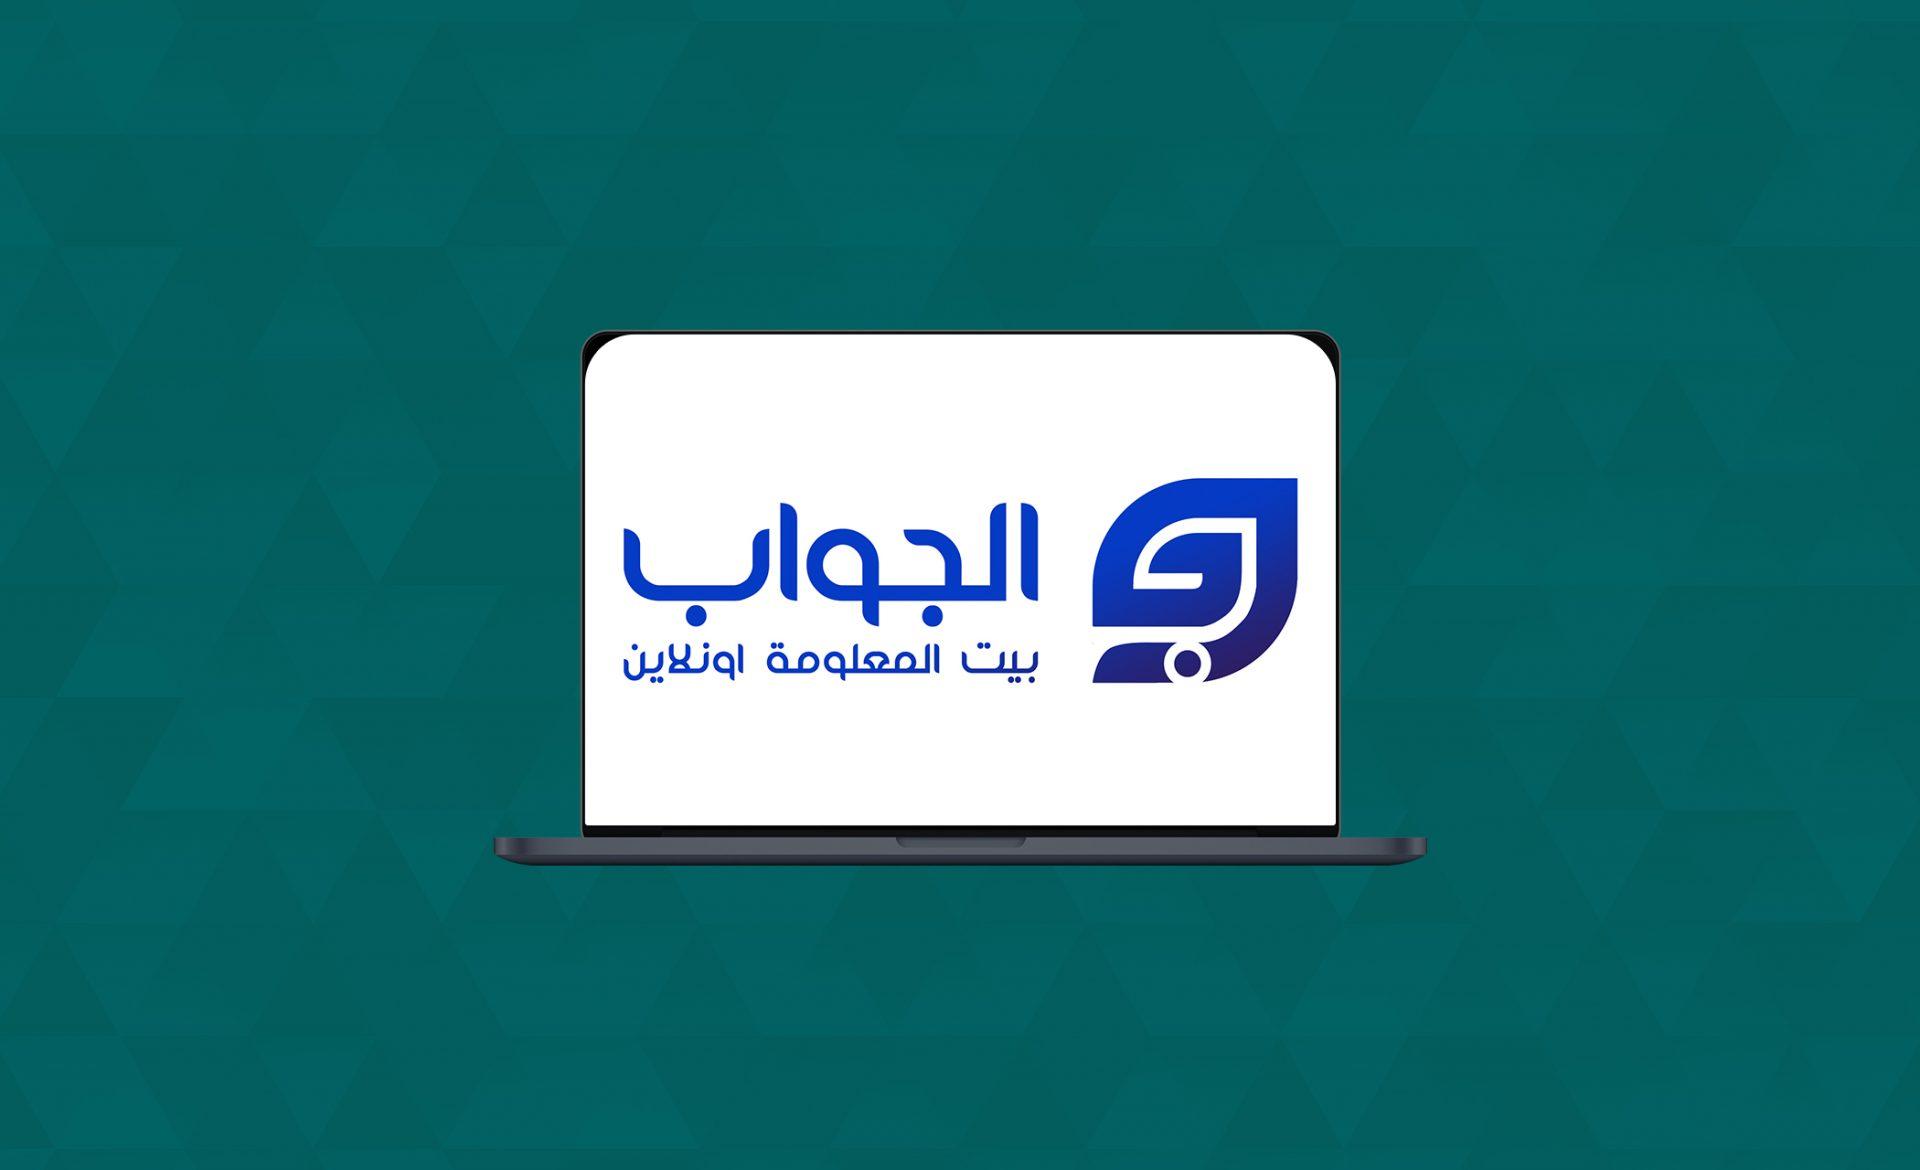 EL GAWAB Logo